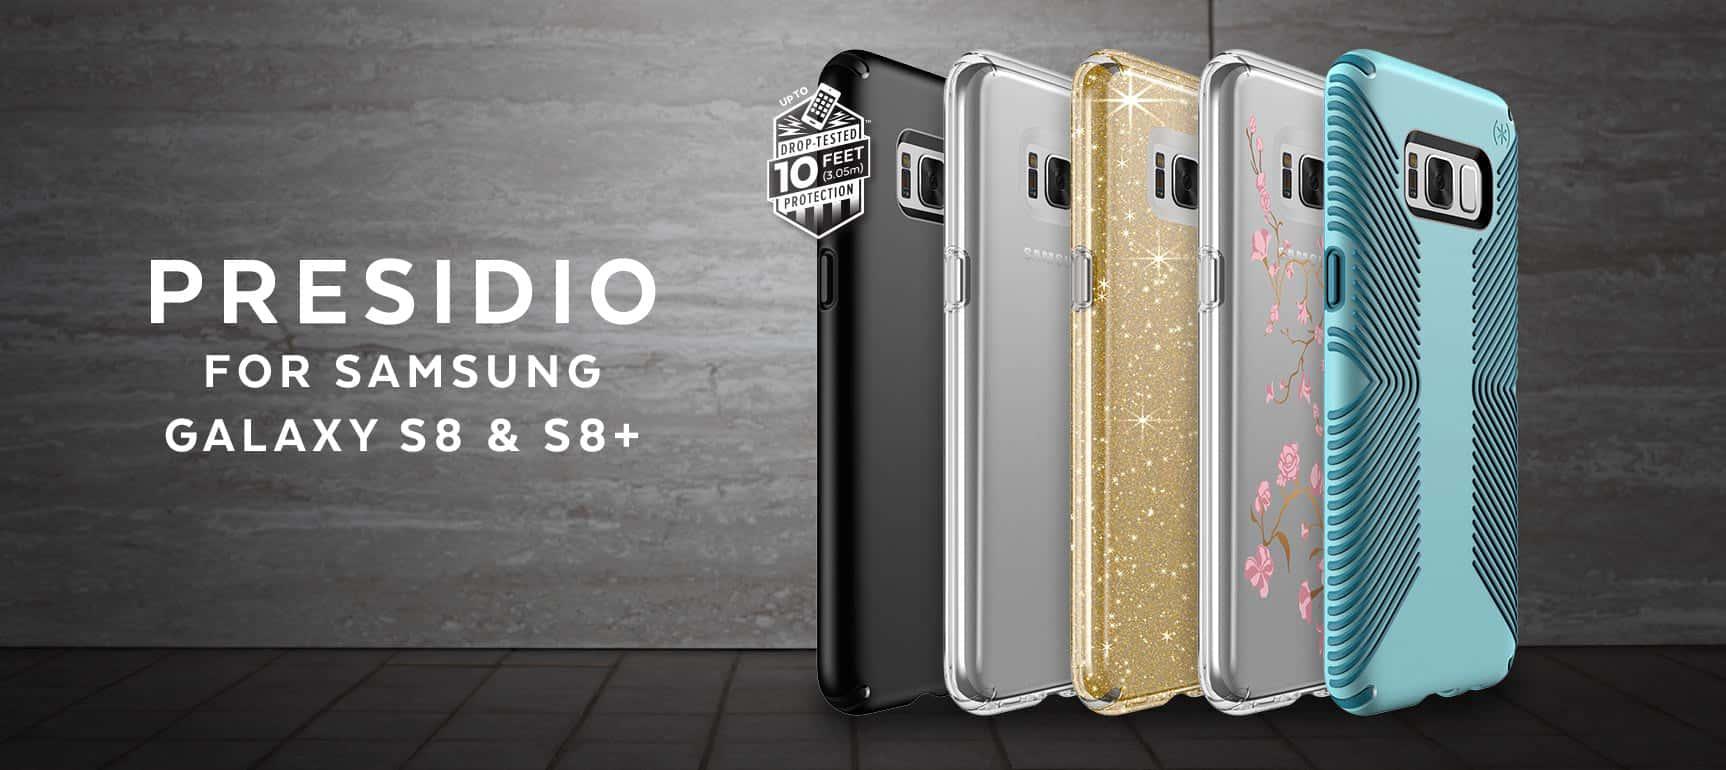 Speck Galaxy S8 Presidio Cases PR